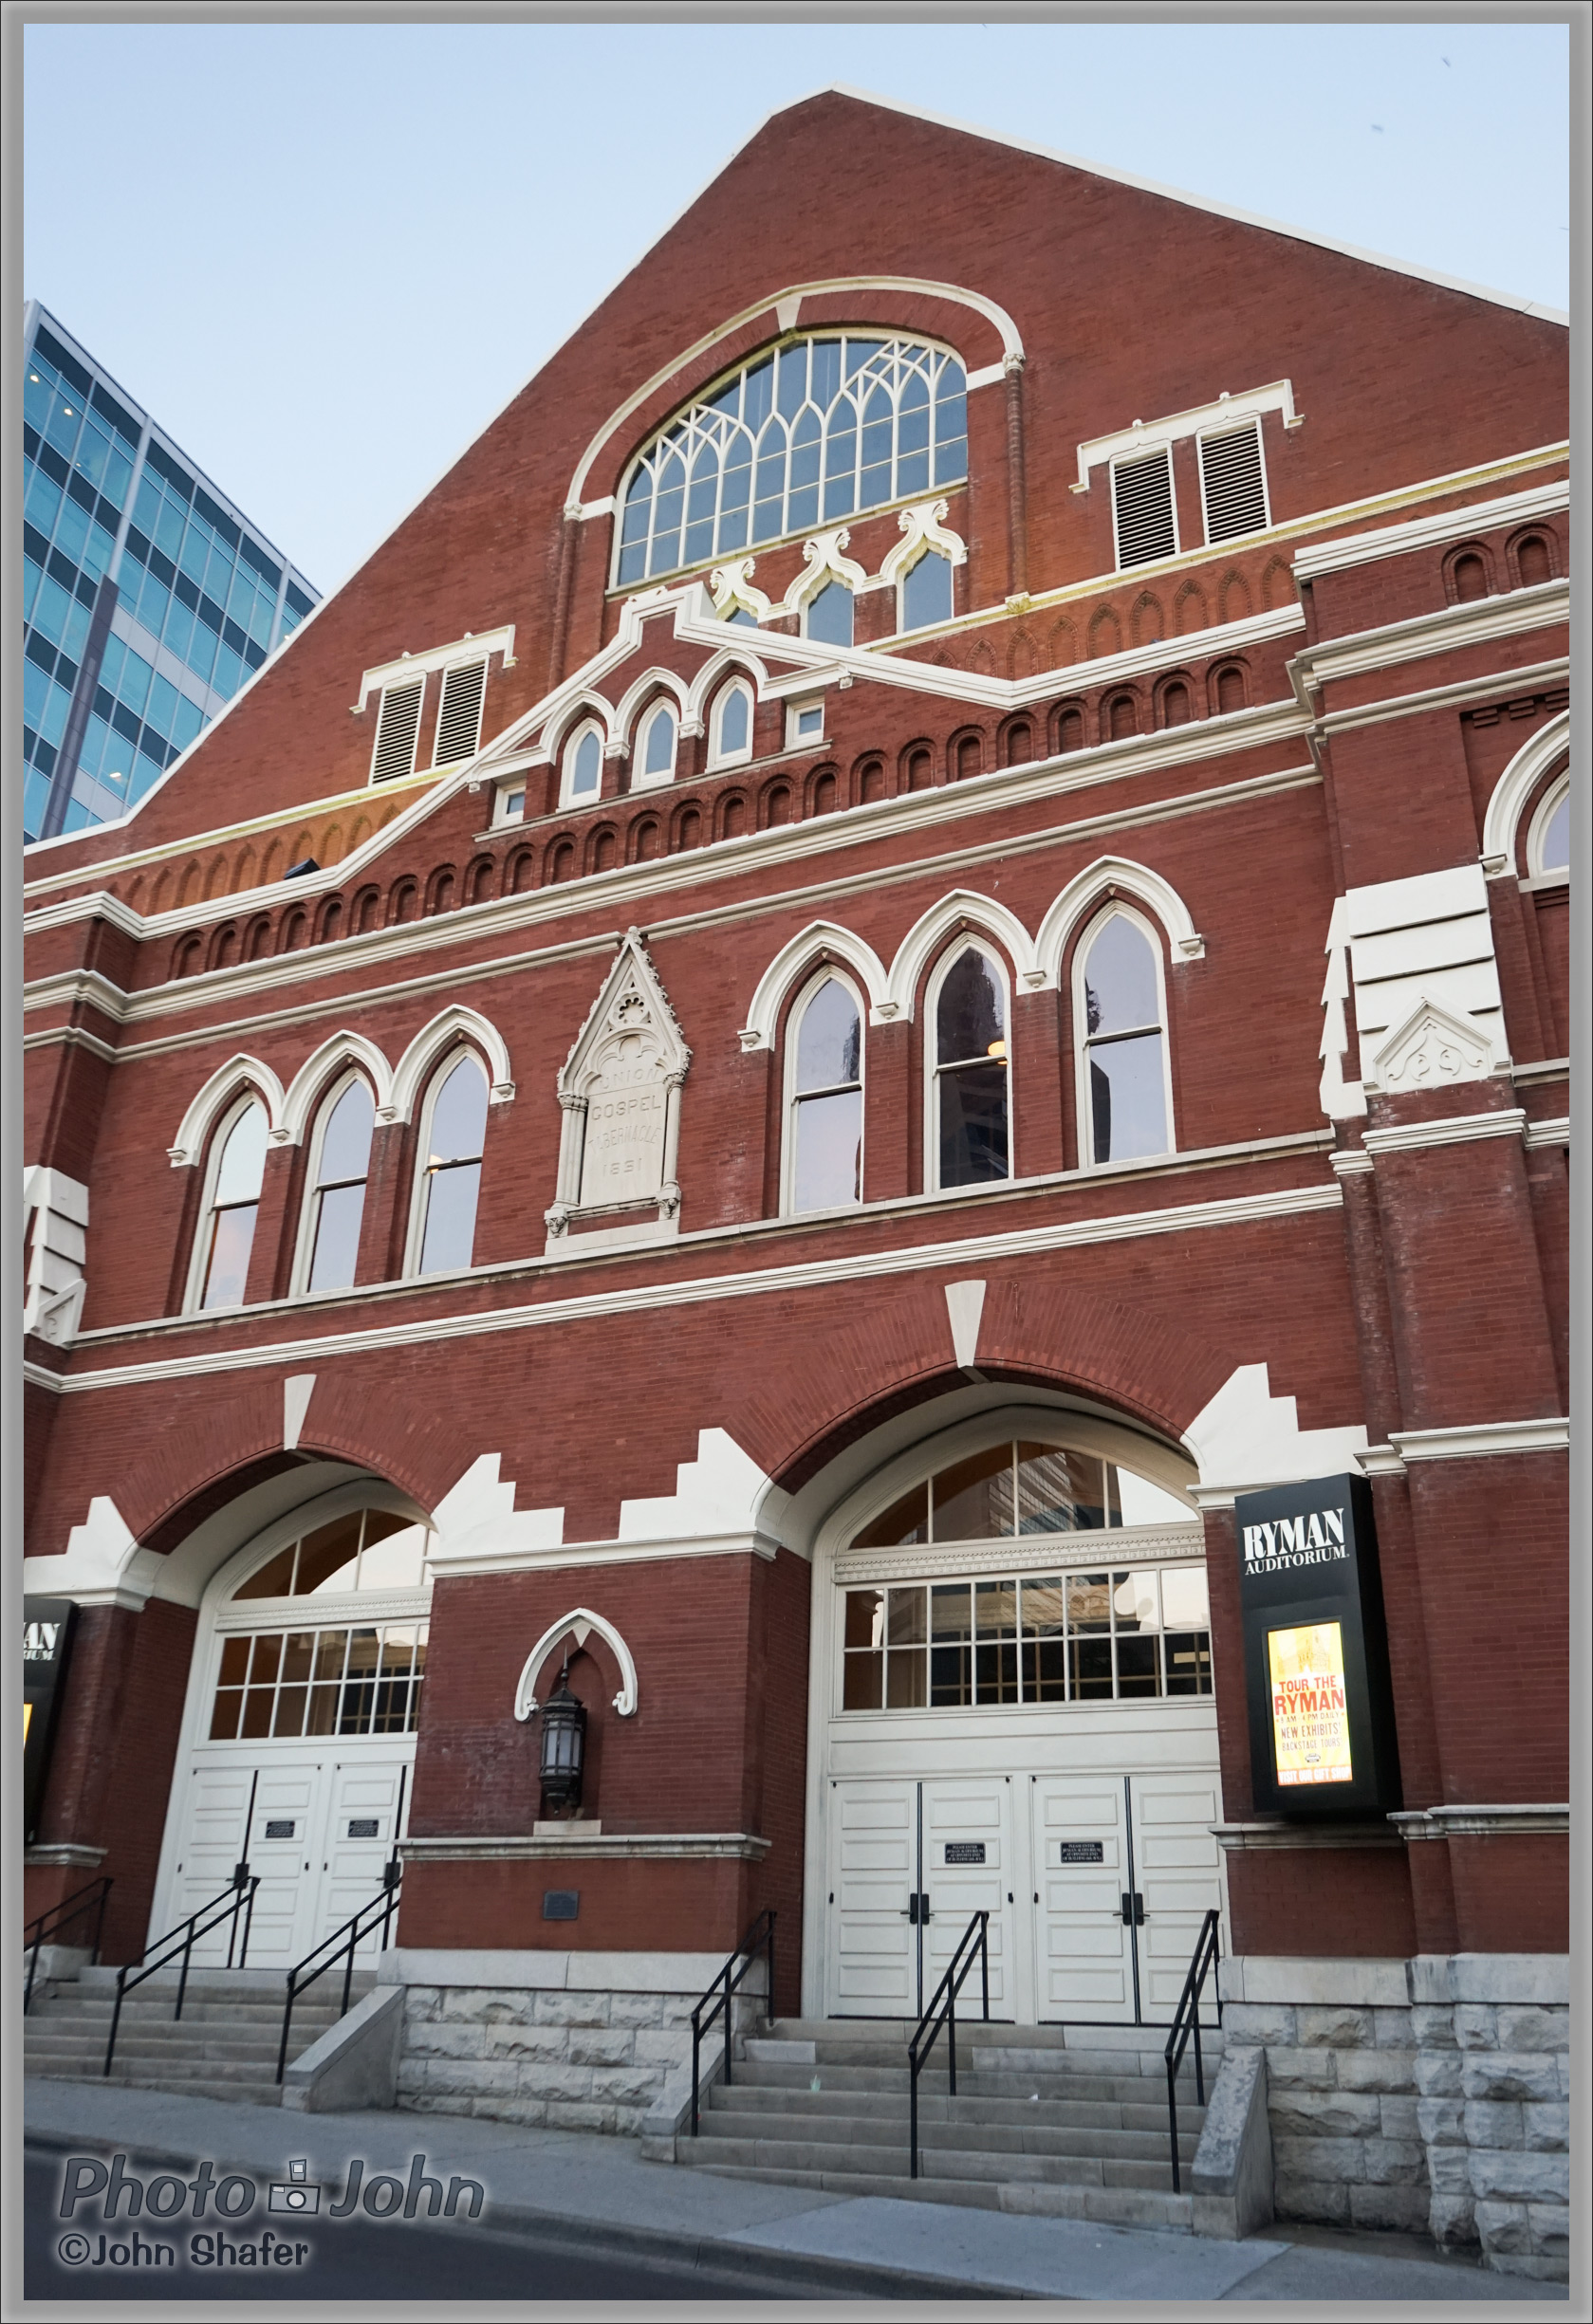 Sony Alpha A7 - Ryman Auditorium - Nashville, Tennessee